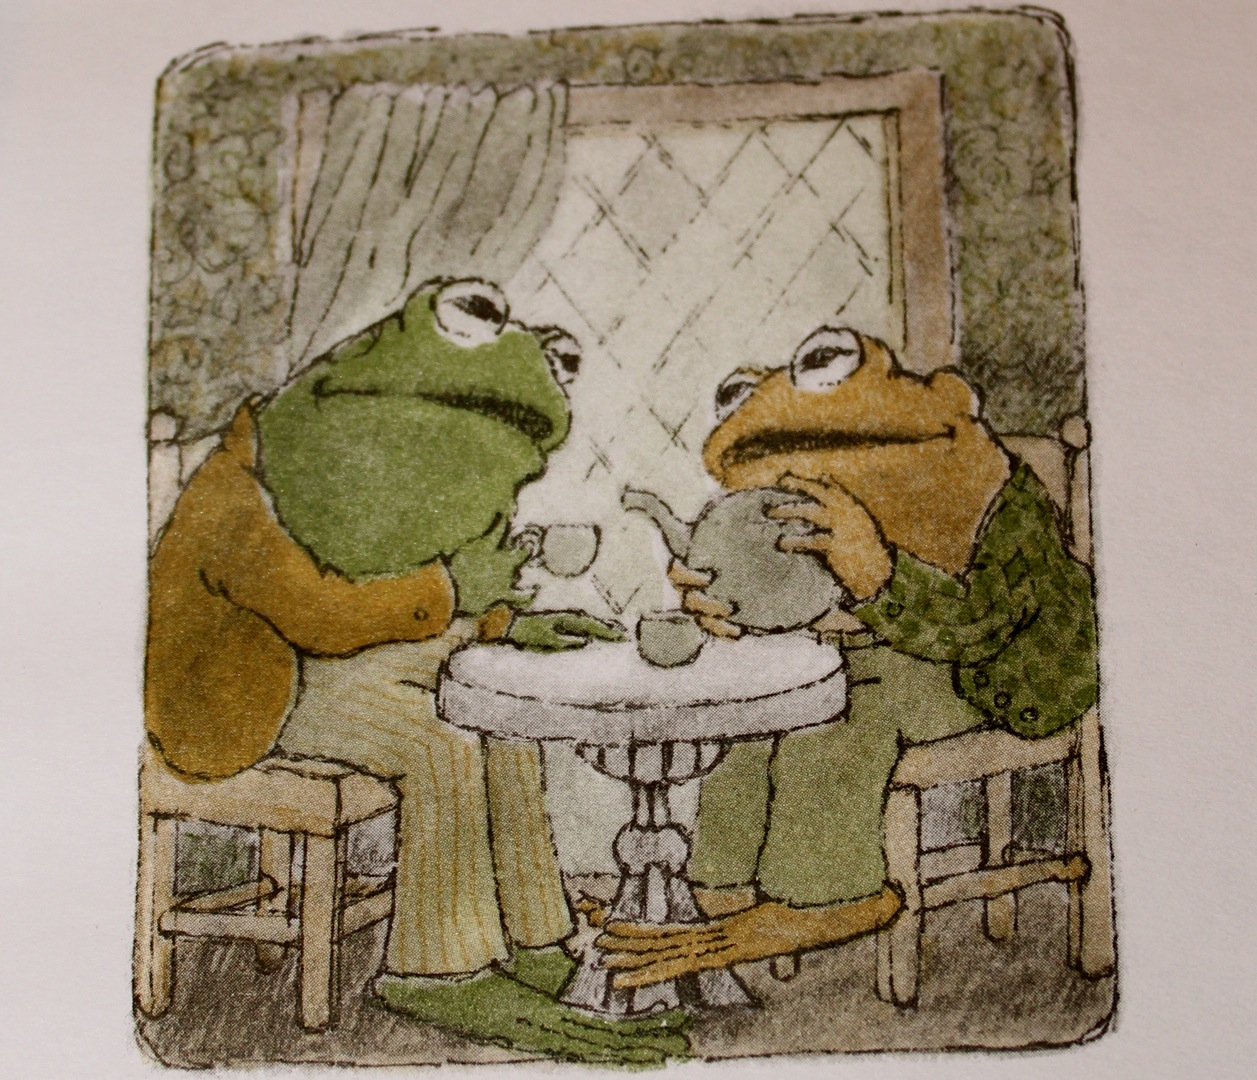 Frog Amp Toad Honoring My Mentors